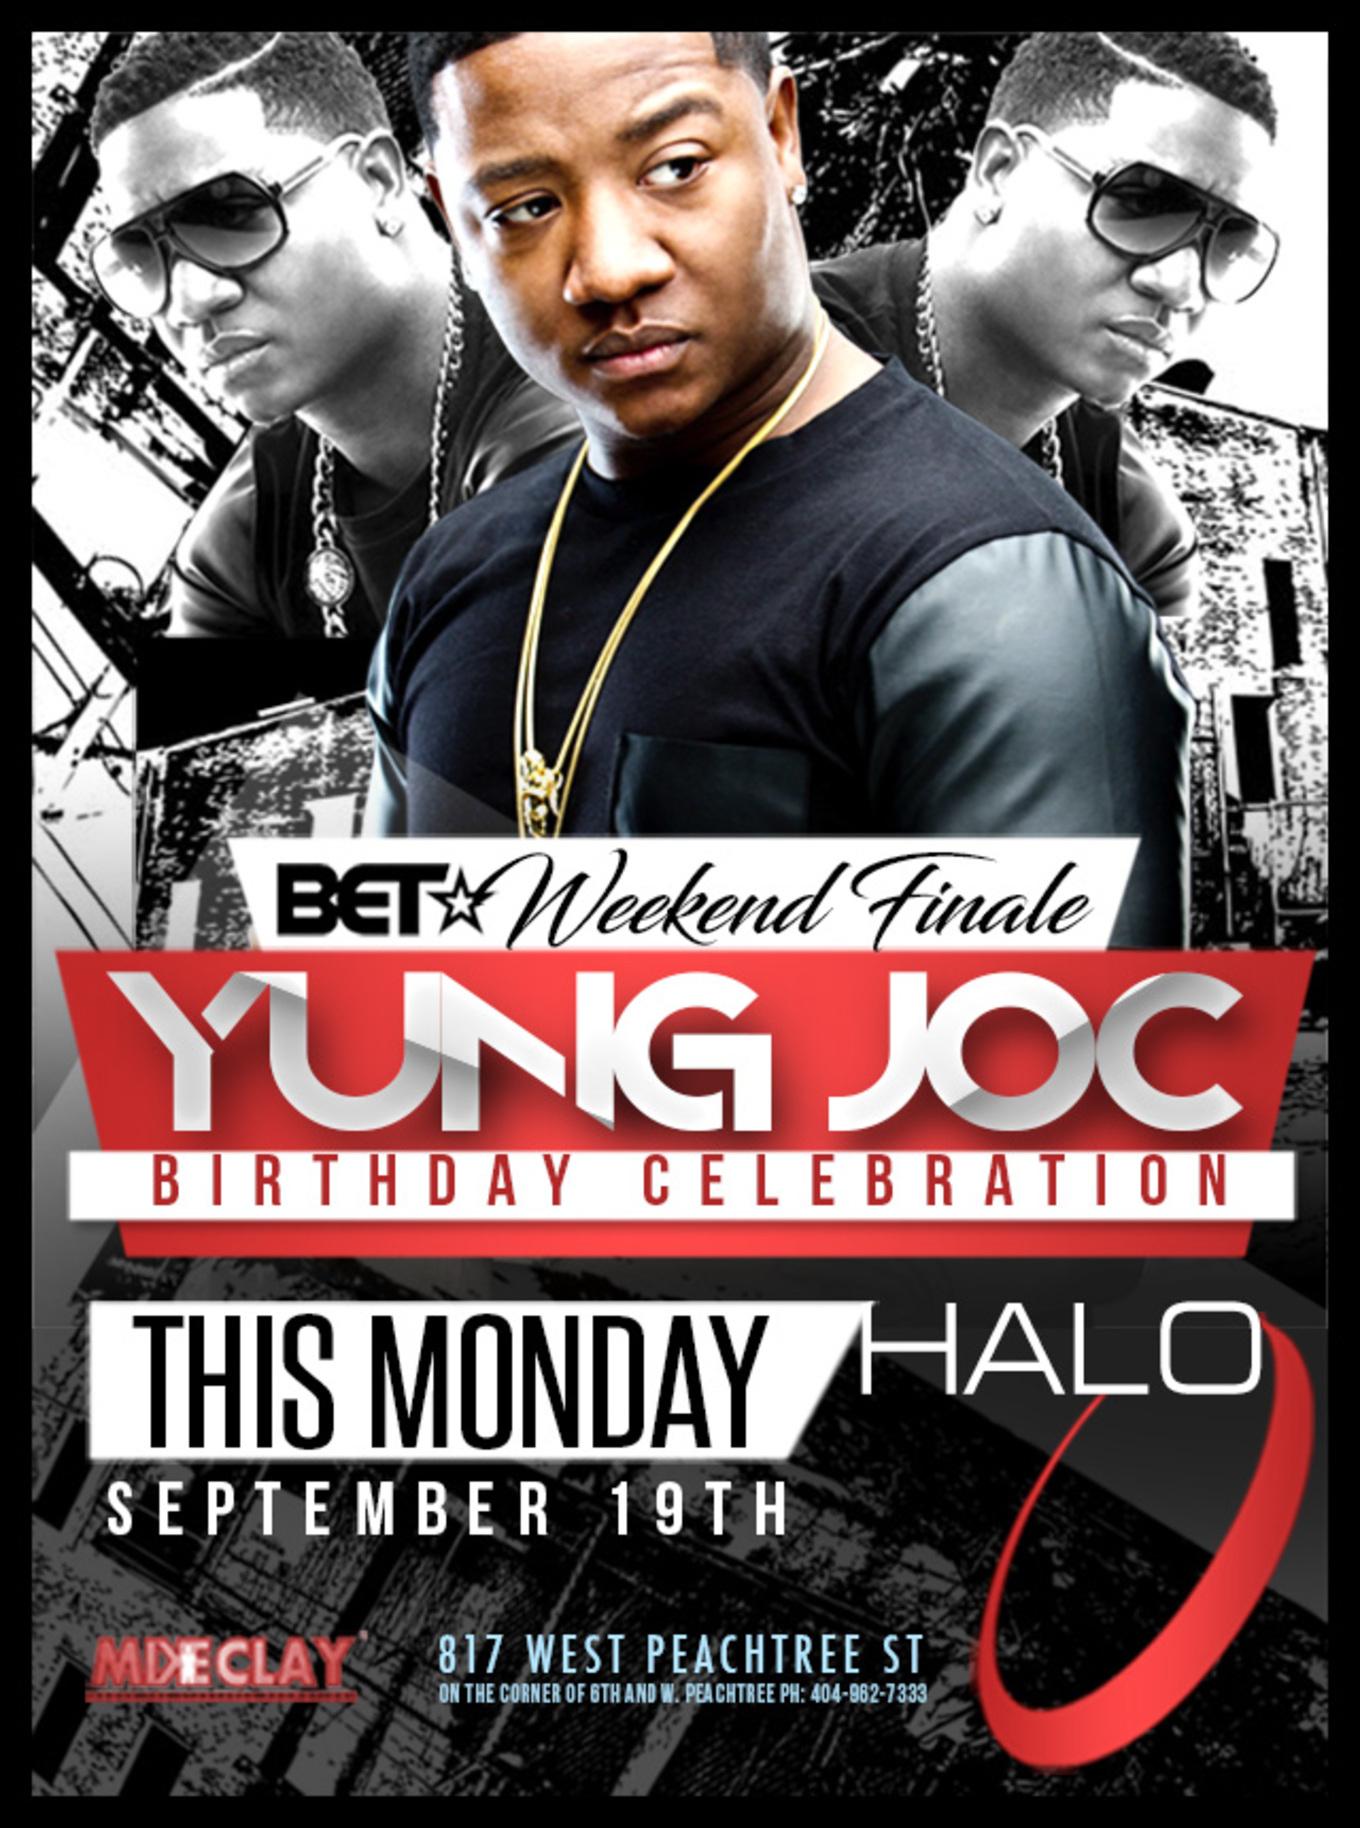 Yung Joc Birthday Celebration Tickets Halo Lounge Atlanta Ga September 19 2016